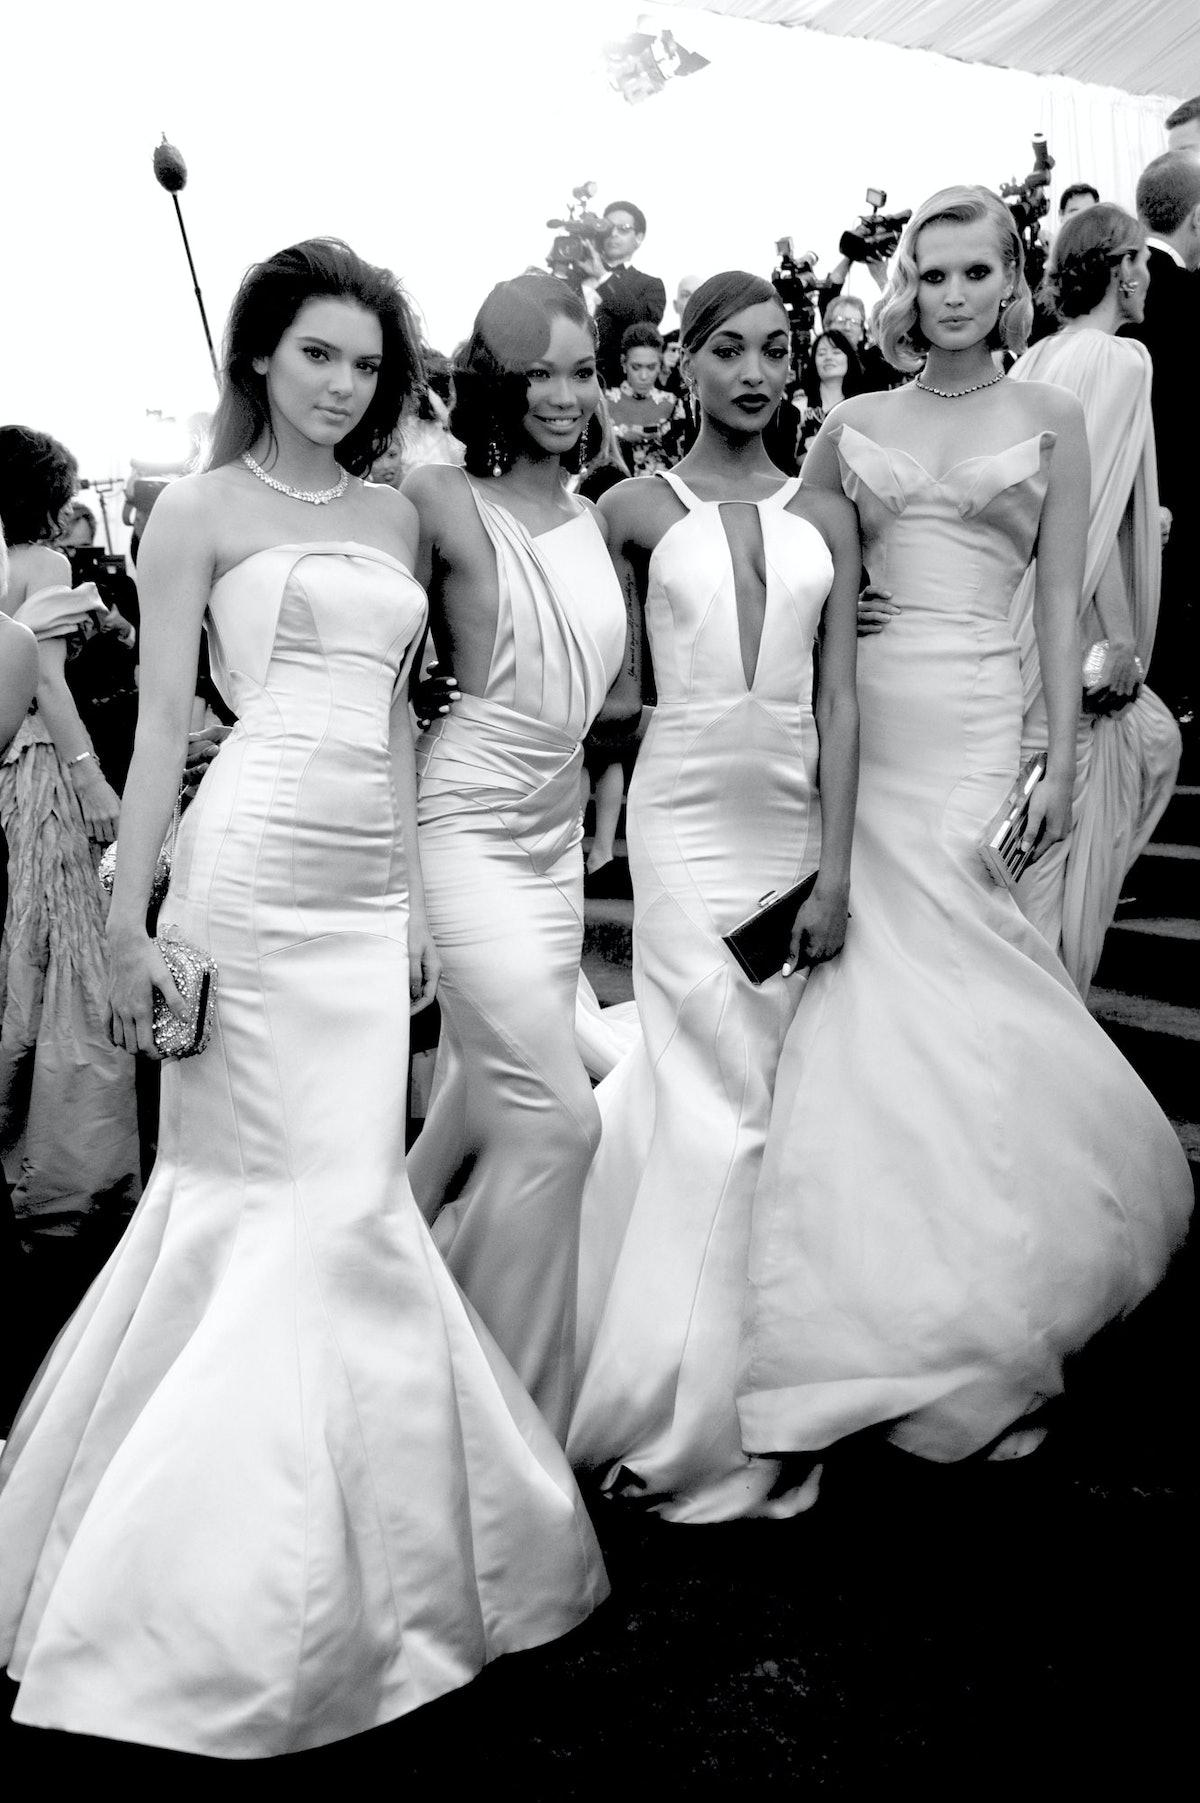 Kendall Jenner, Chanel Iman, Jourdan Dunn, and Toni Garrn